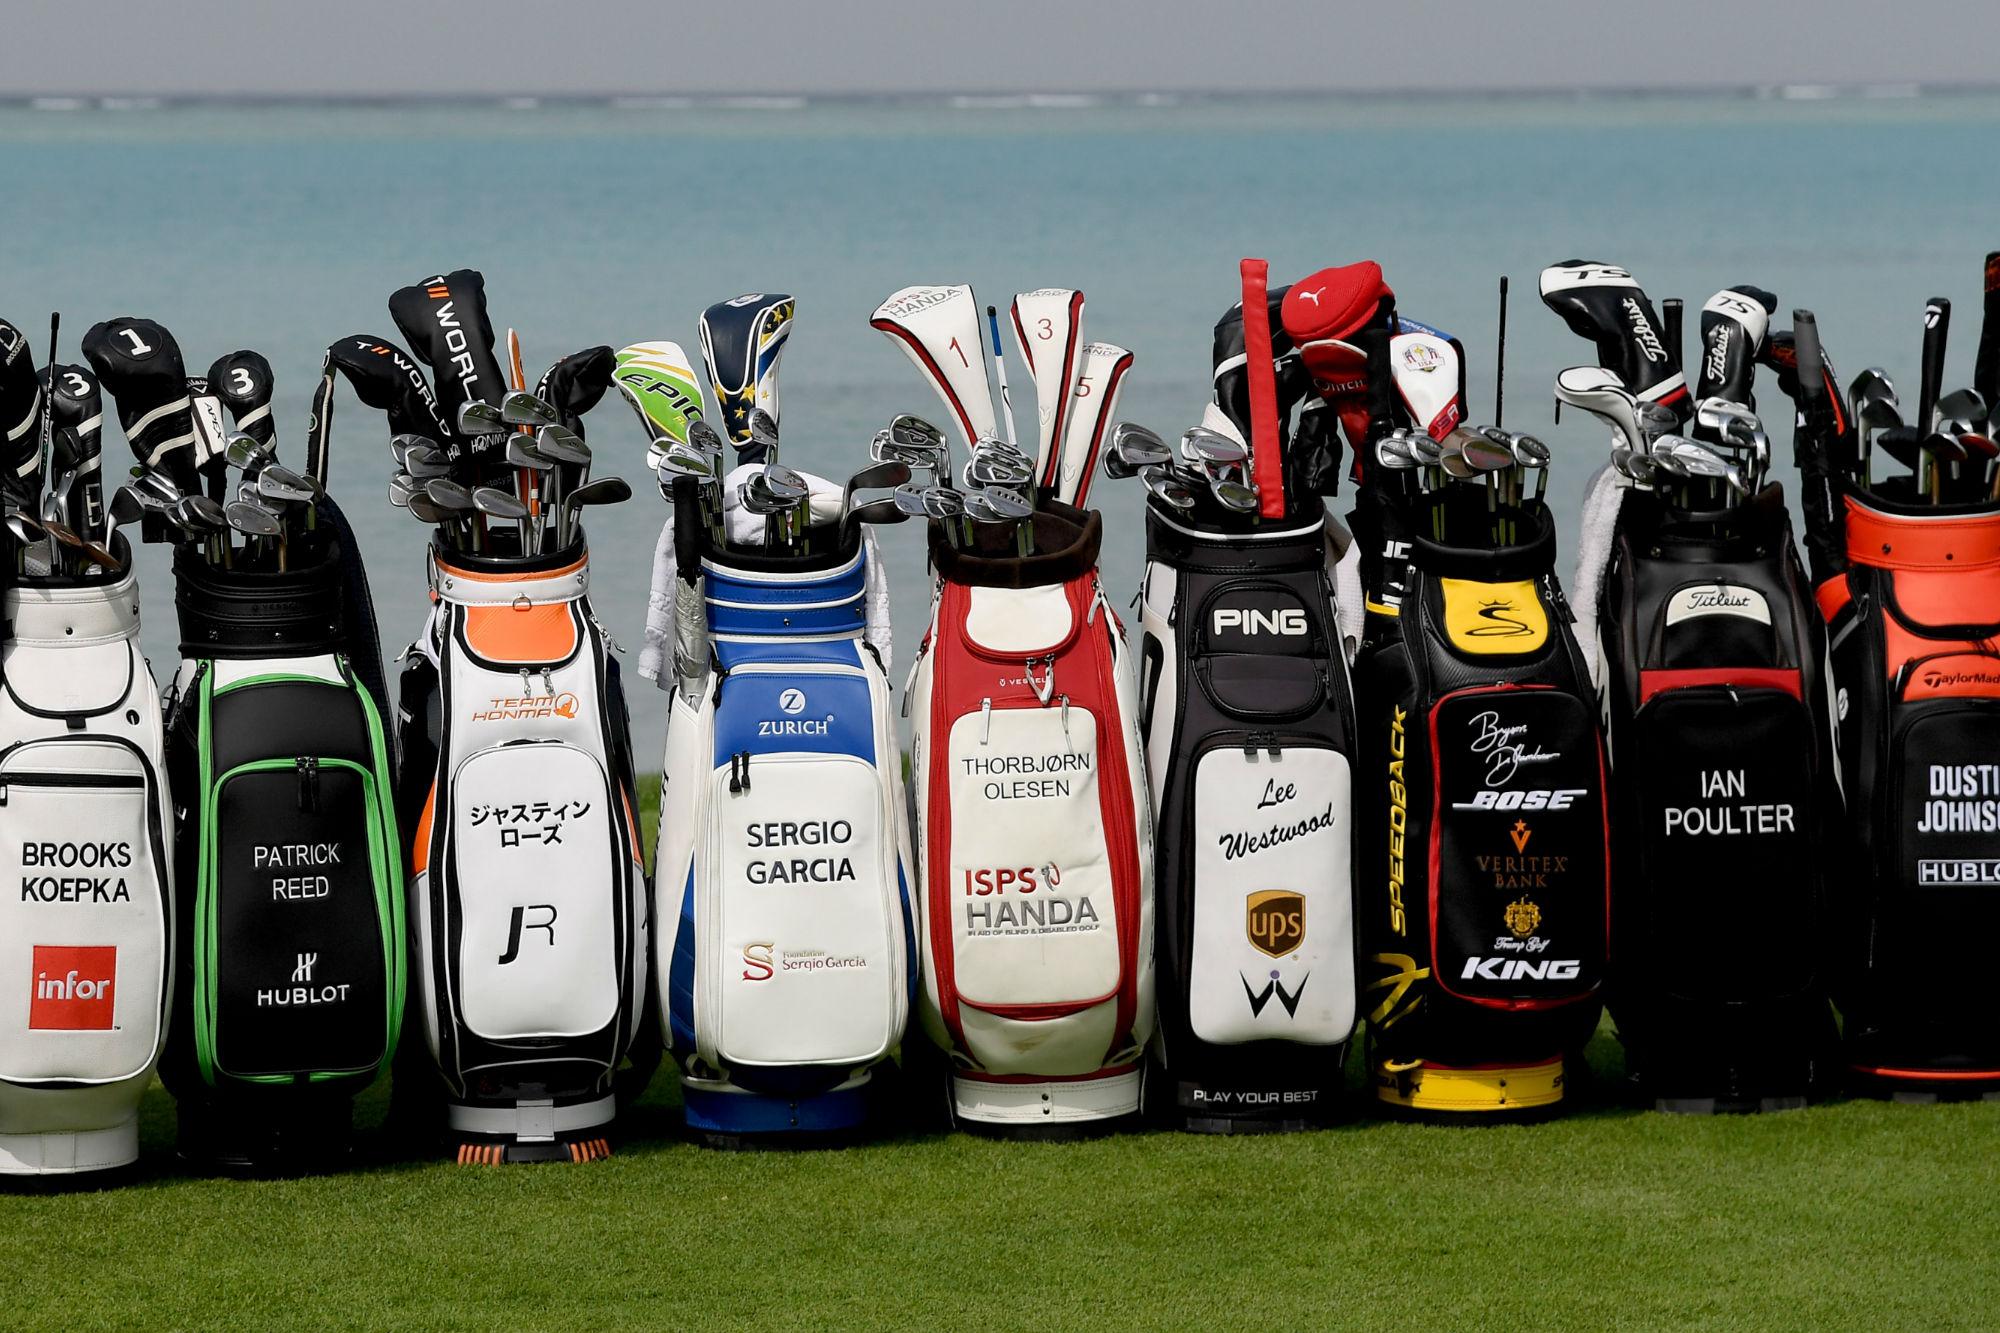 PGA Golf Bag from a golf supplier